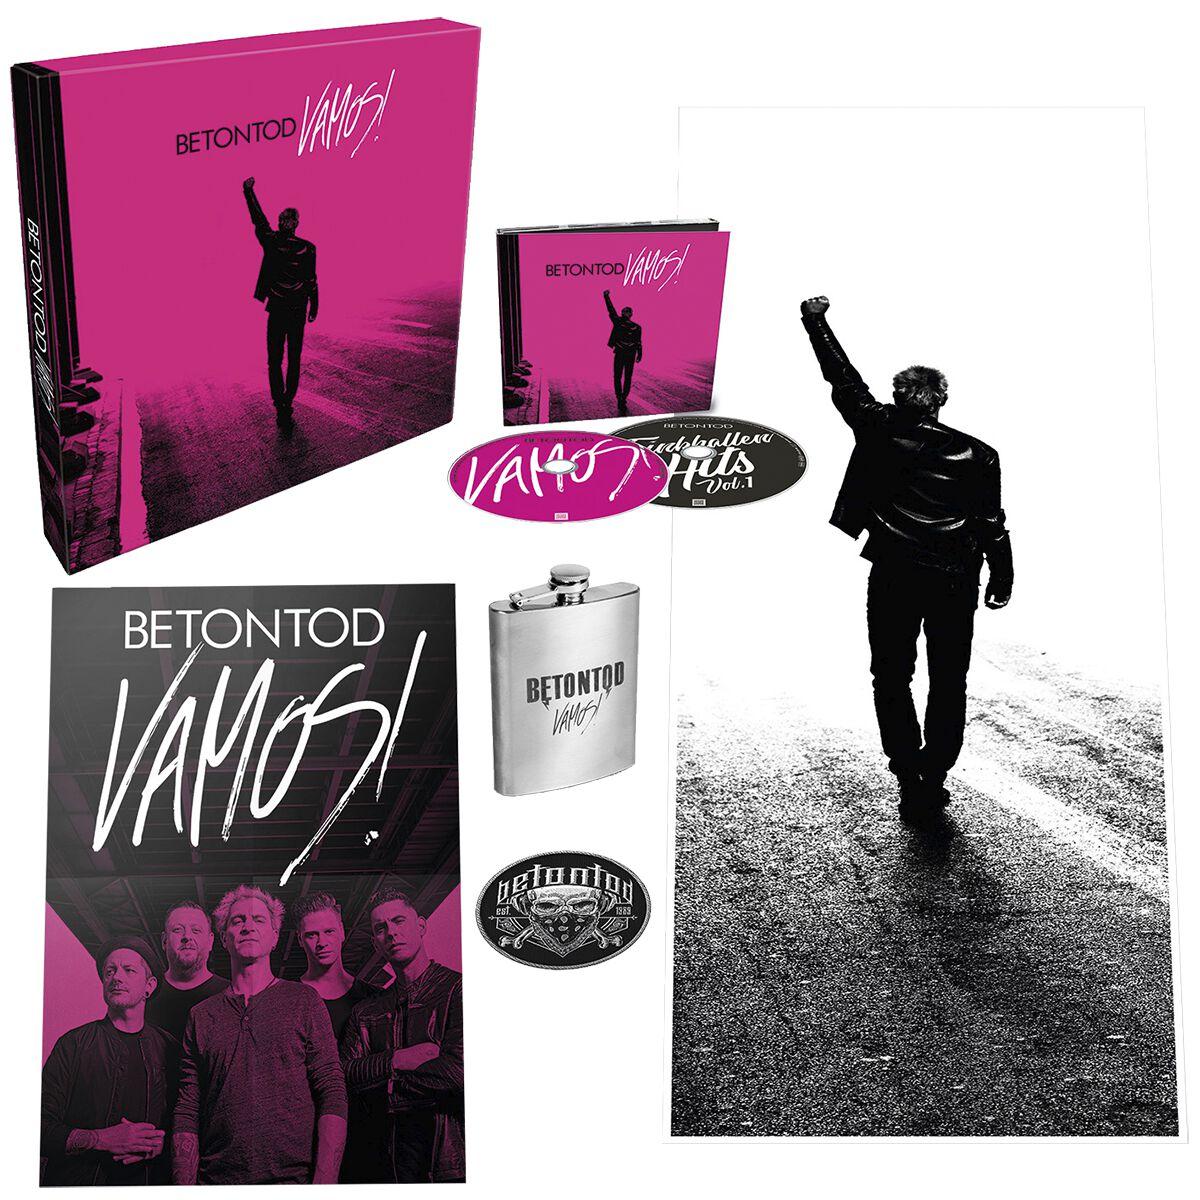 Betontod Vamos! / Trinkhallen Hits 2-CD Standard